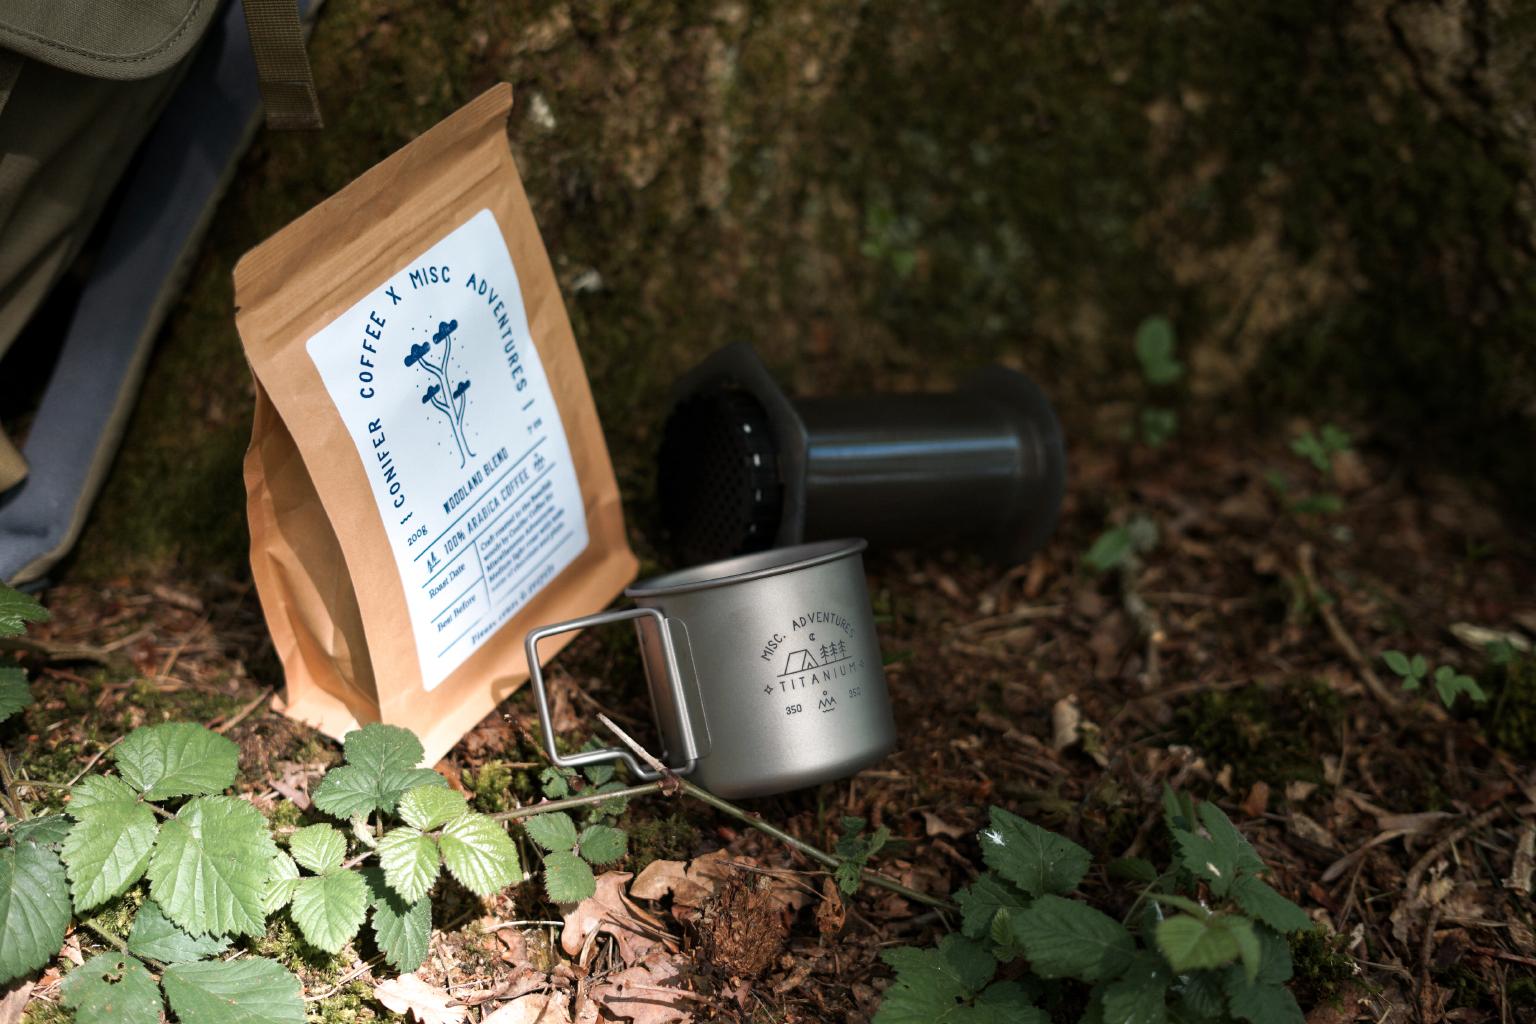 conifer_coffee_in_the_woods_2.jpg